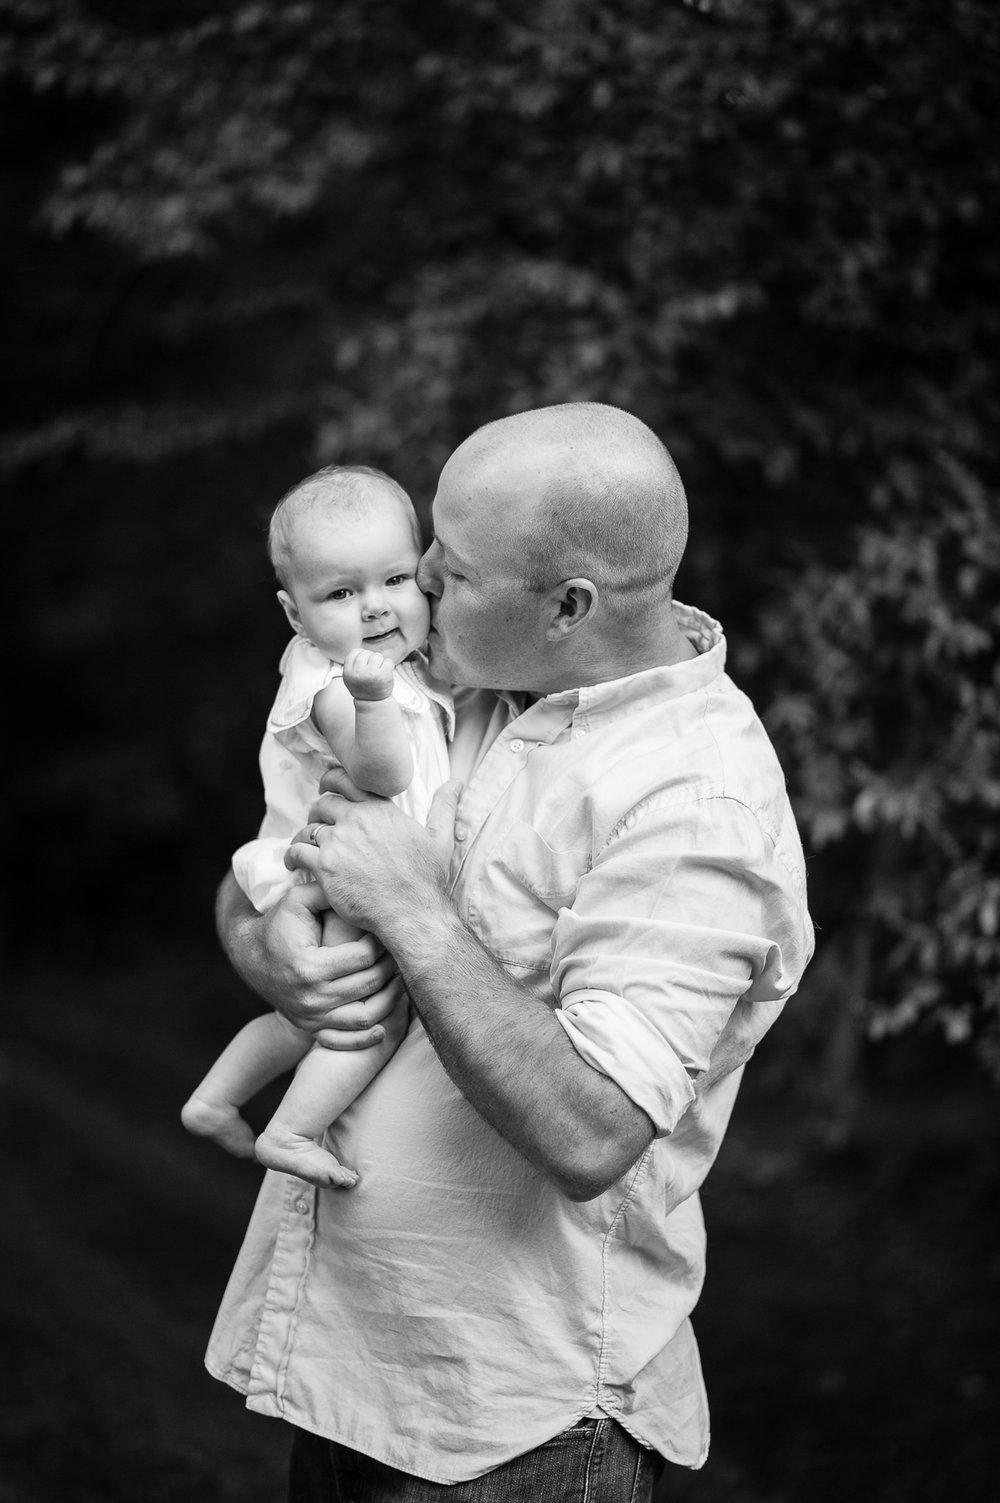 ClaireElisePhotography_Newborn-304.jpg